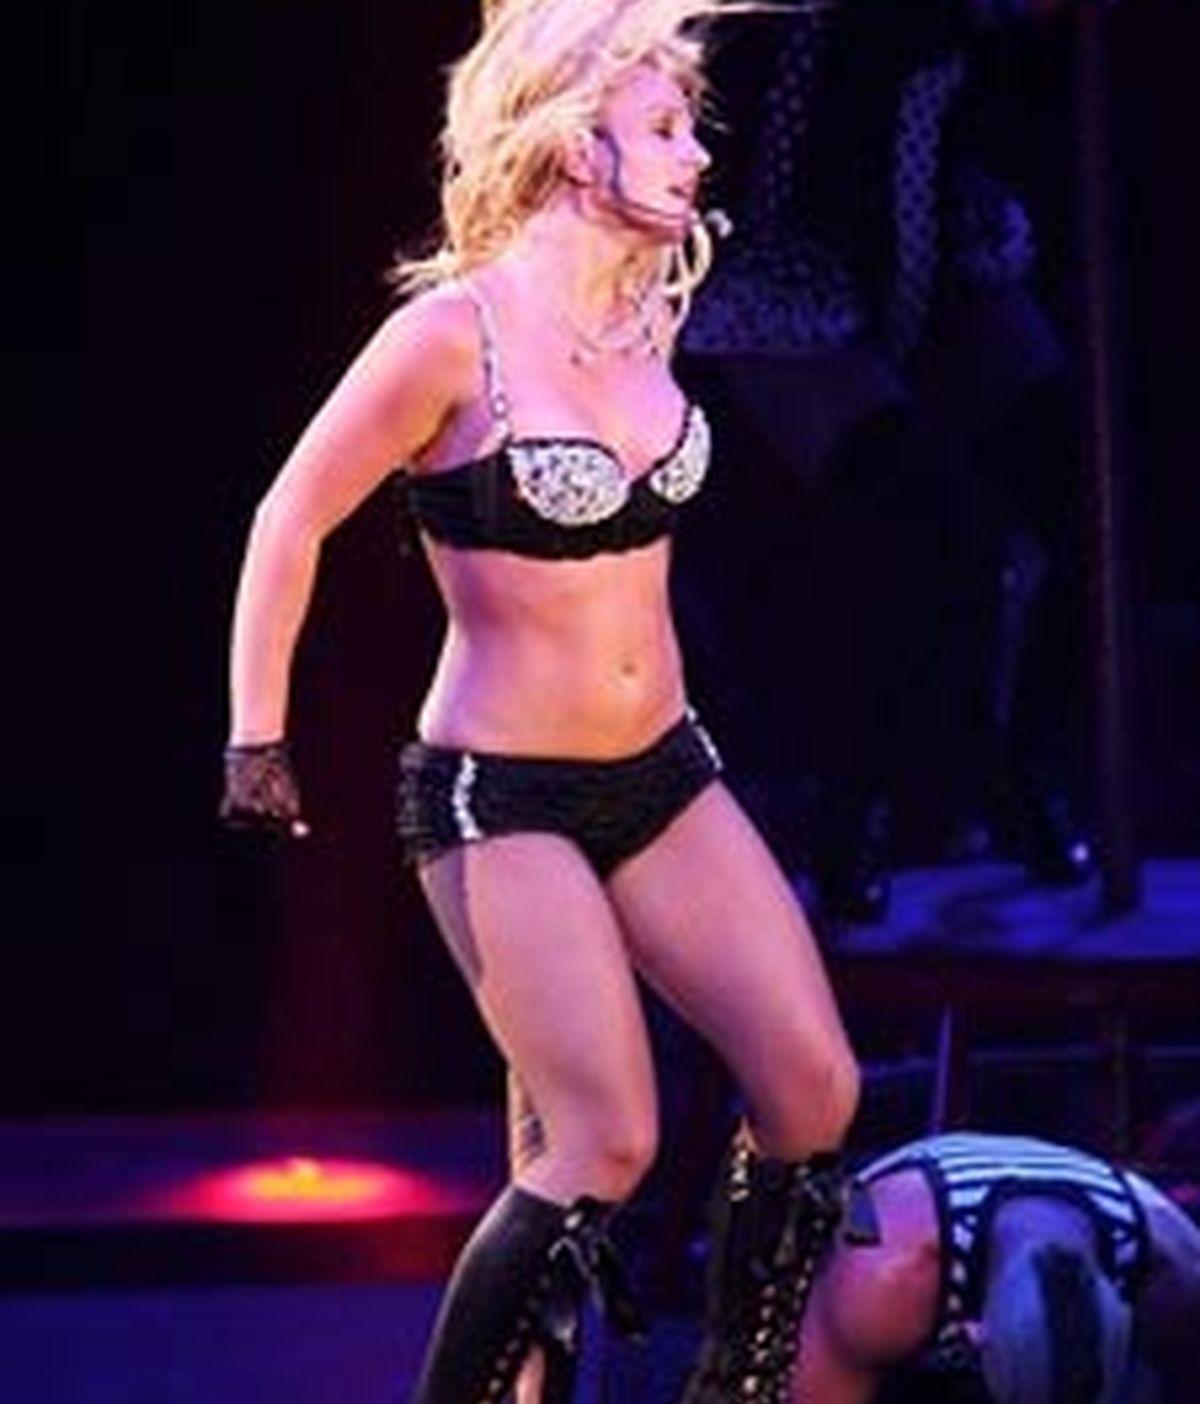 Un momento del espectáculo de Britney Spears. Foto: The Sun